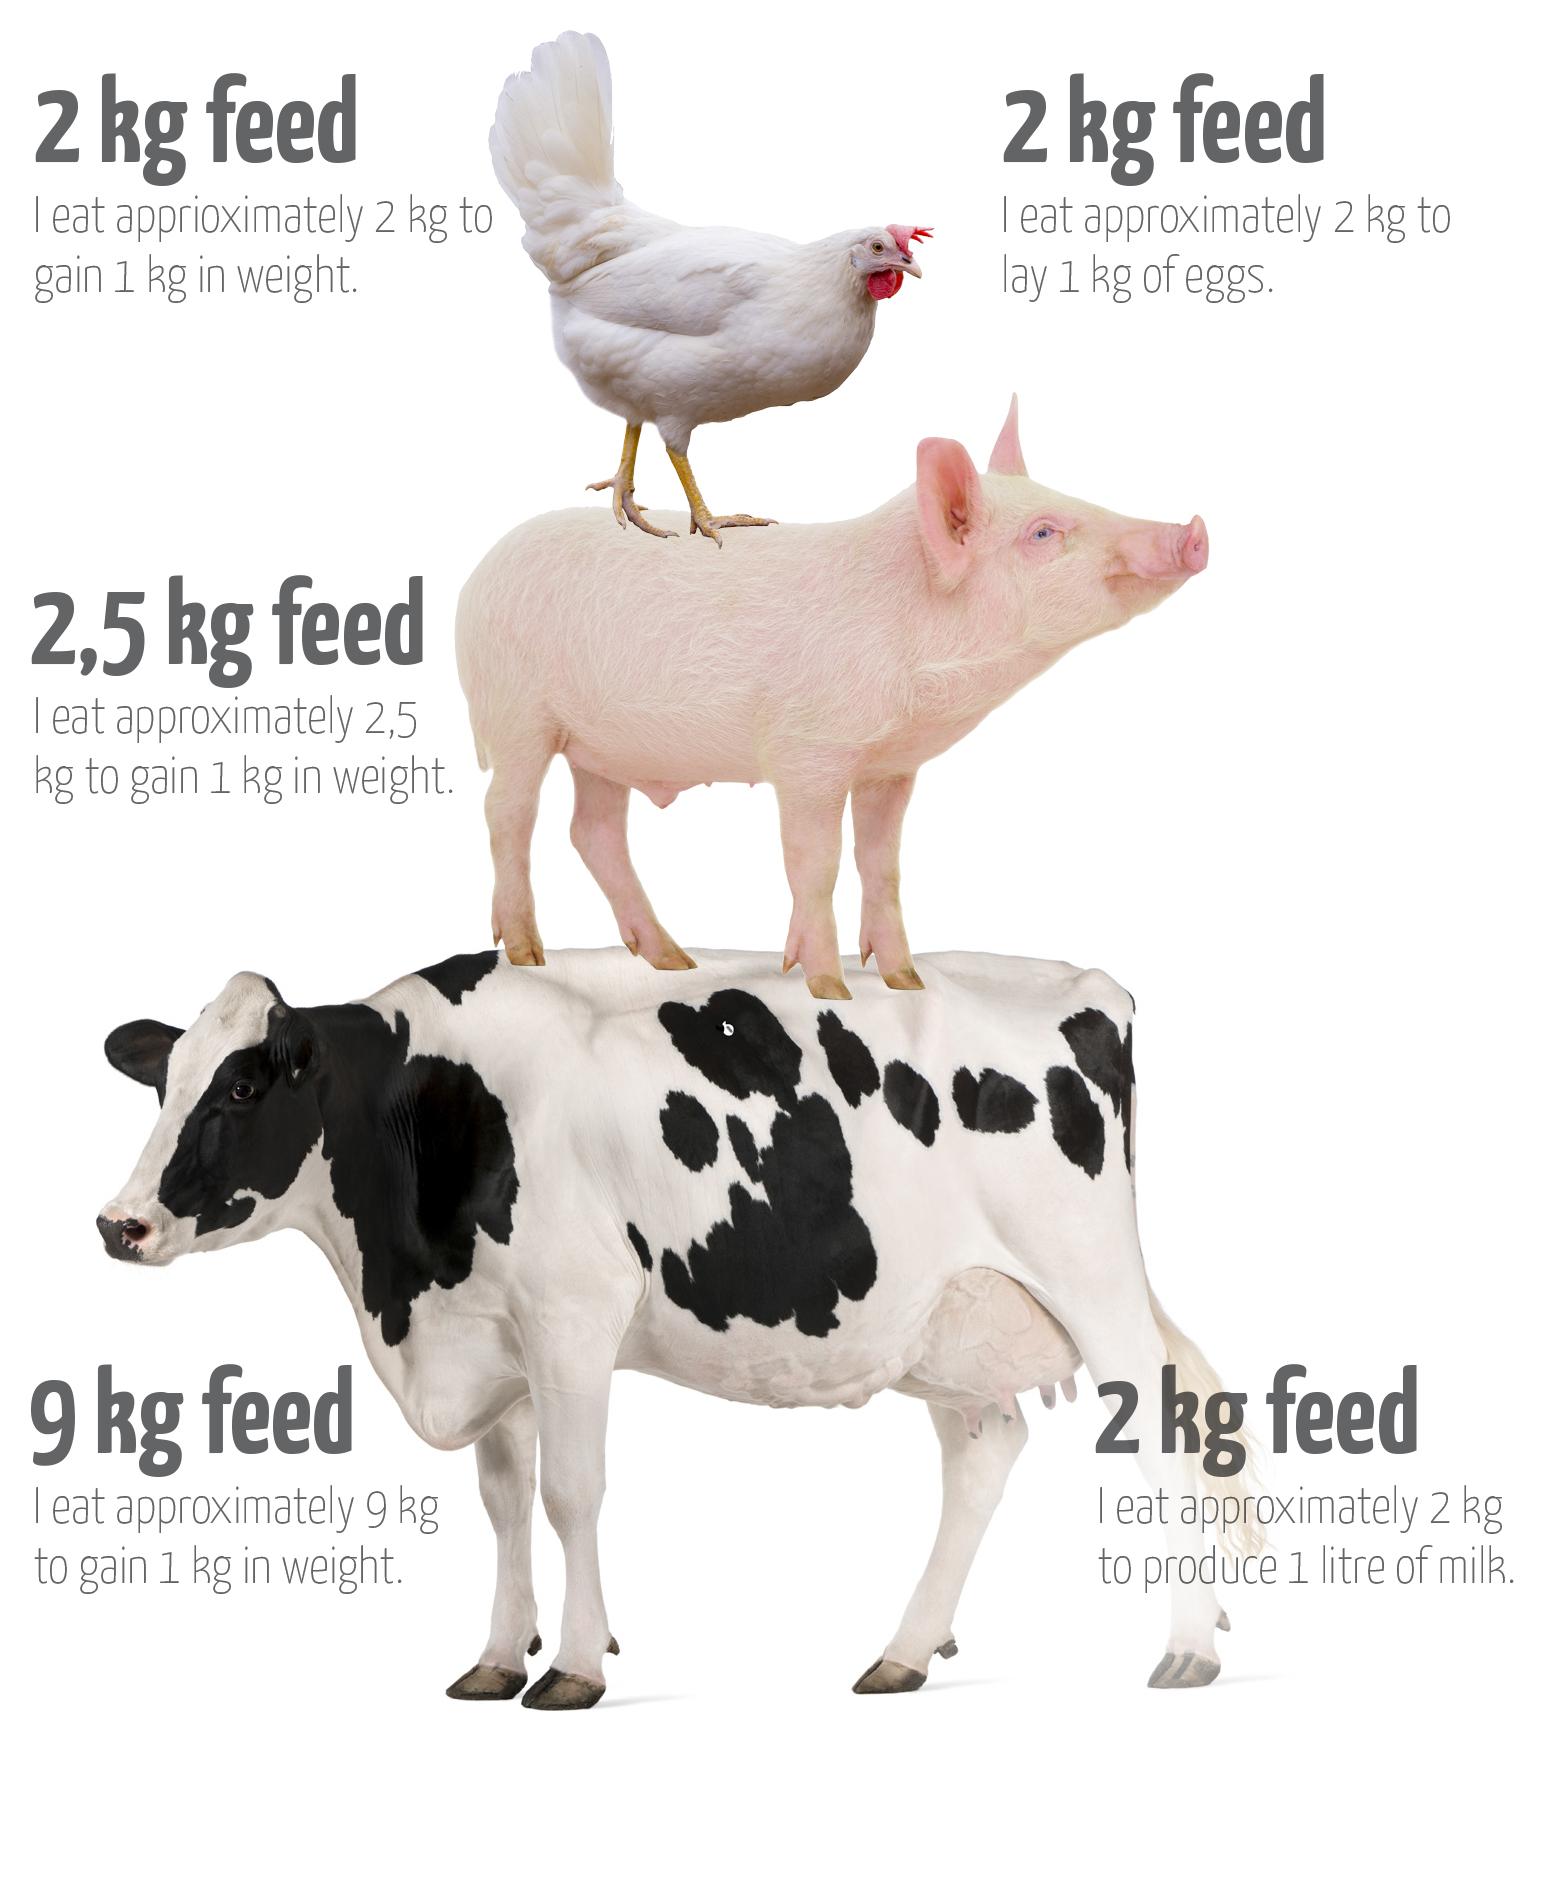 wat eten dieren engels